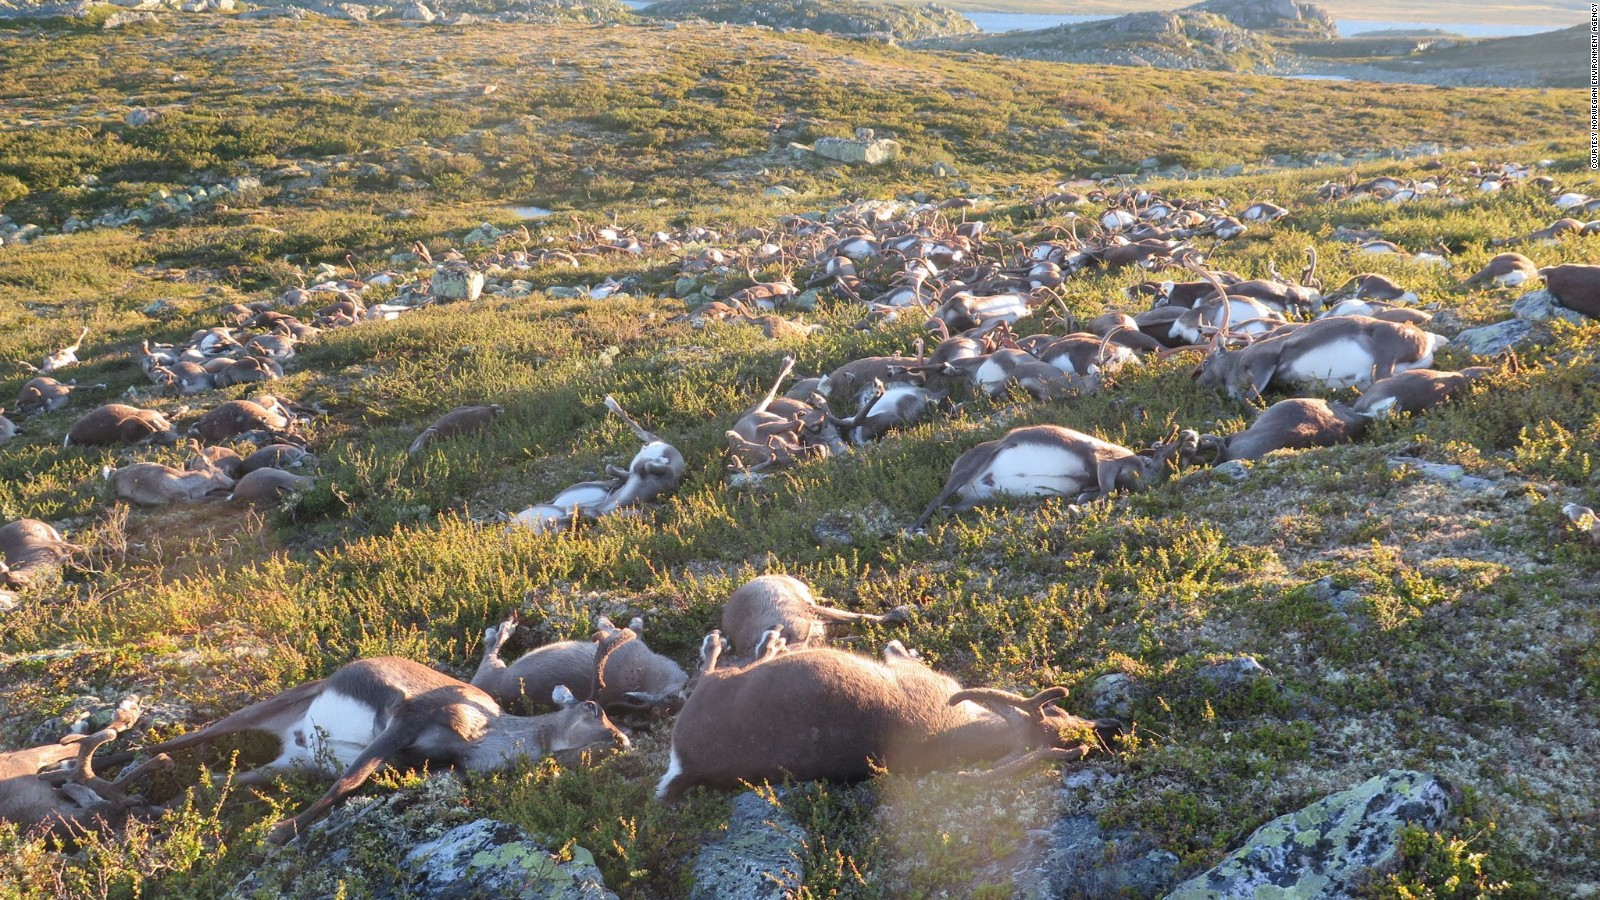 norway more than 300 reindeer killed by lightning cnn